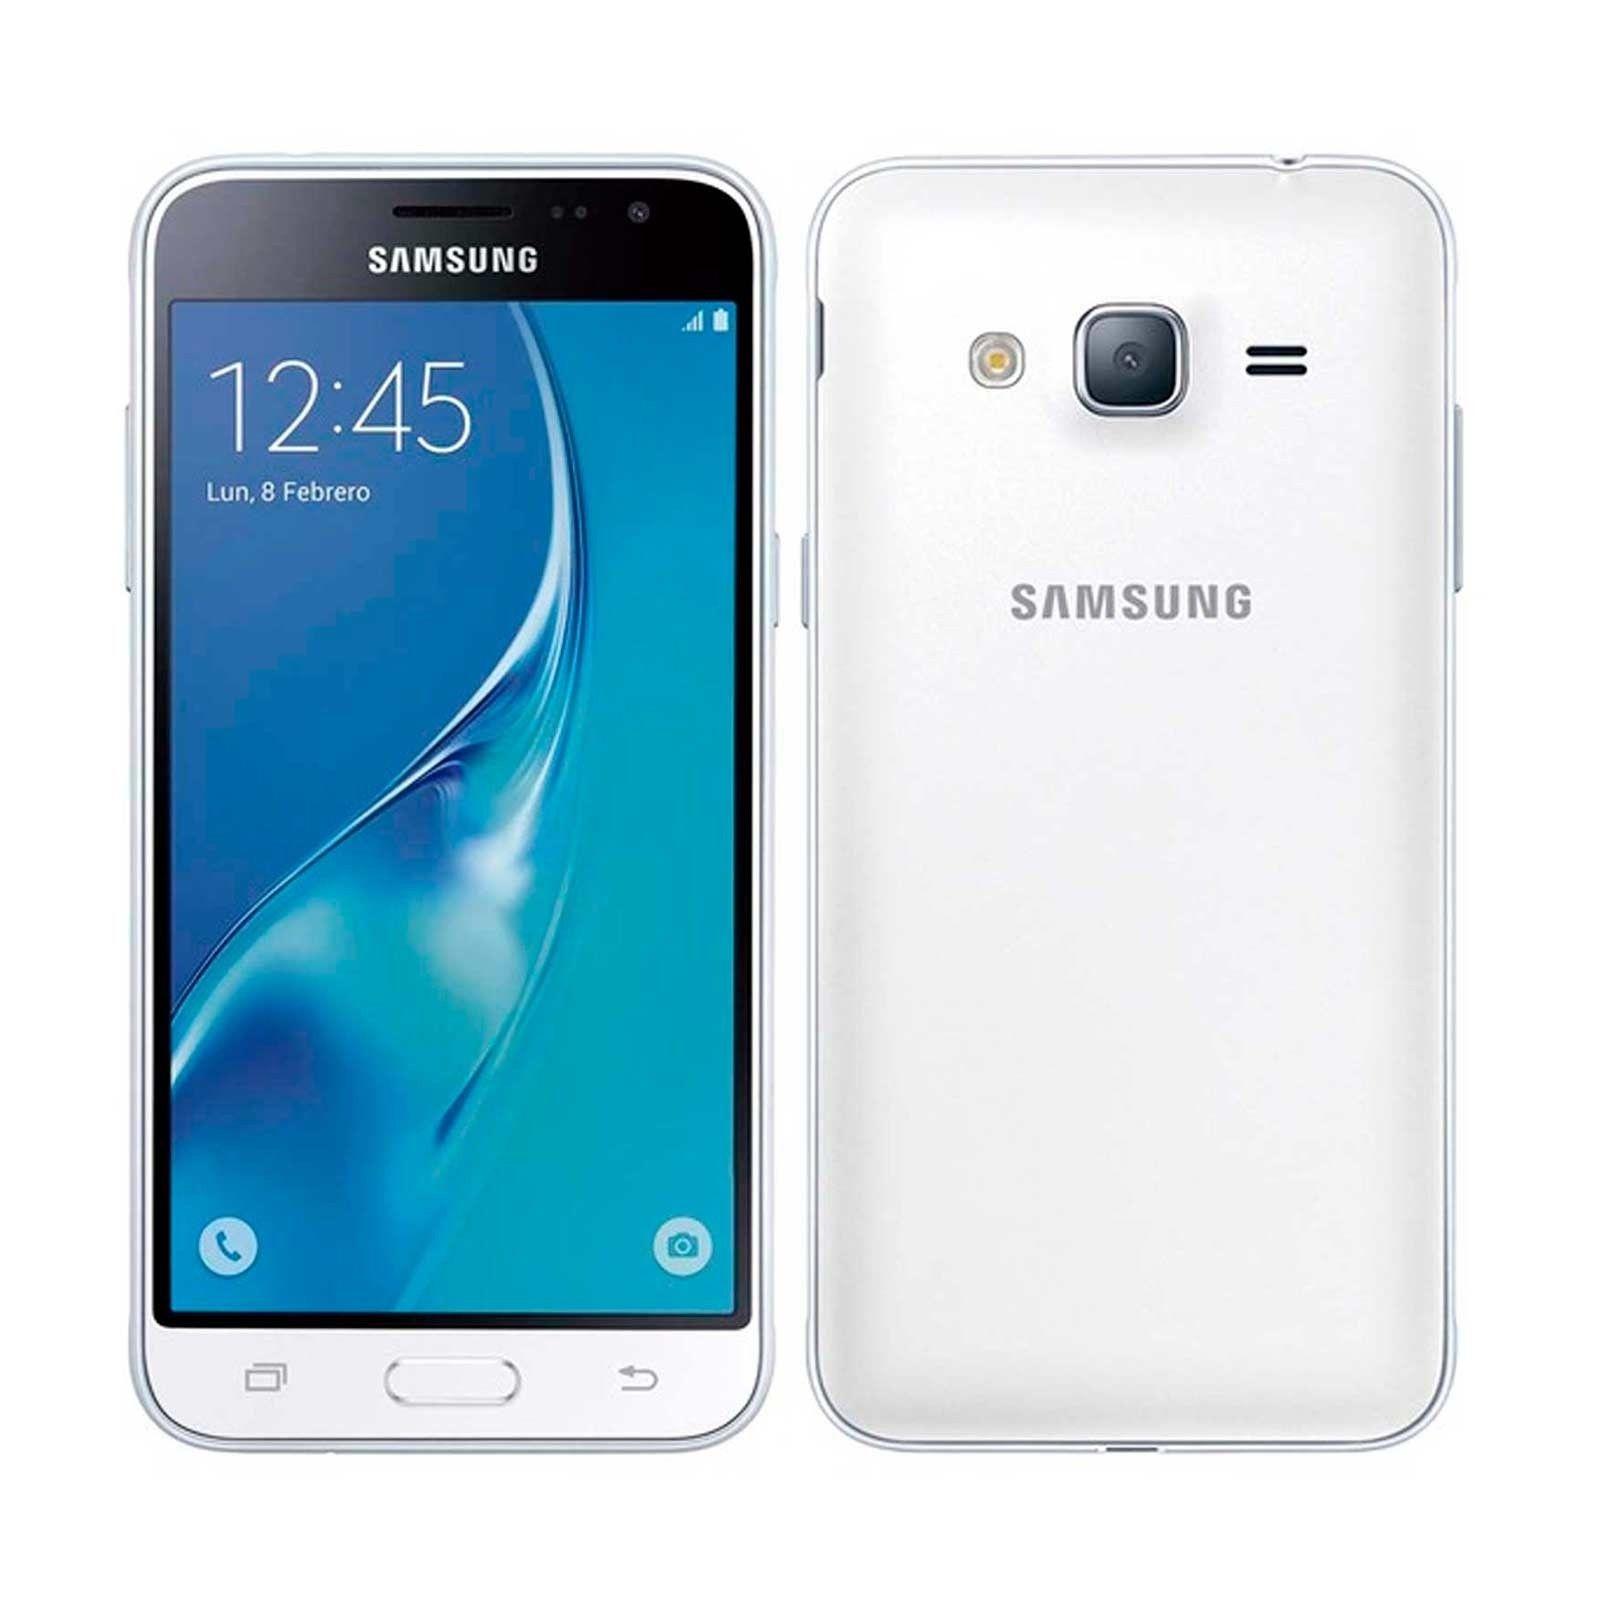 Samsung Galaxy J3 2016 Price in Nigeria